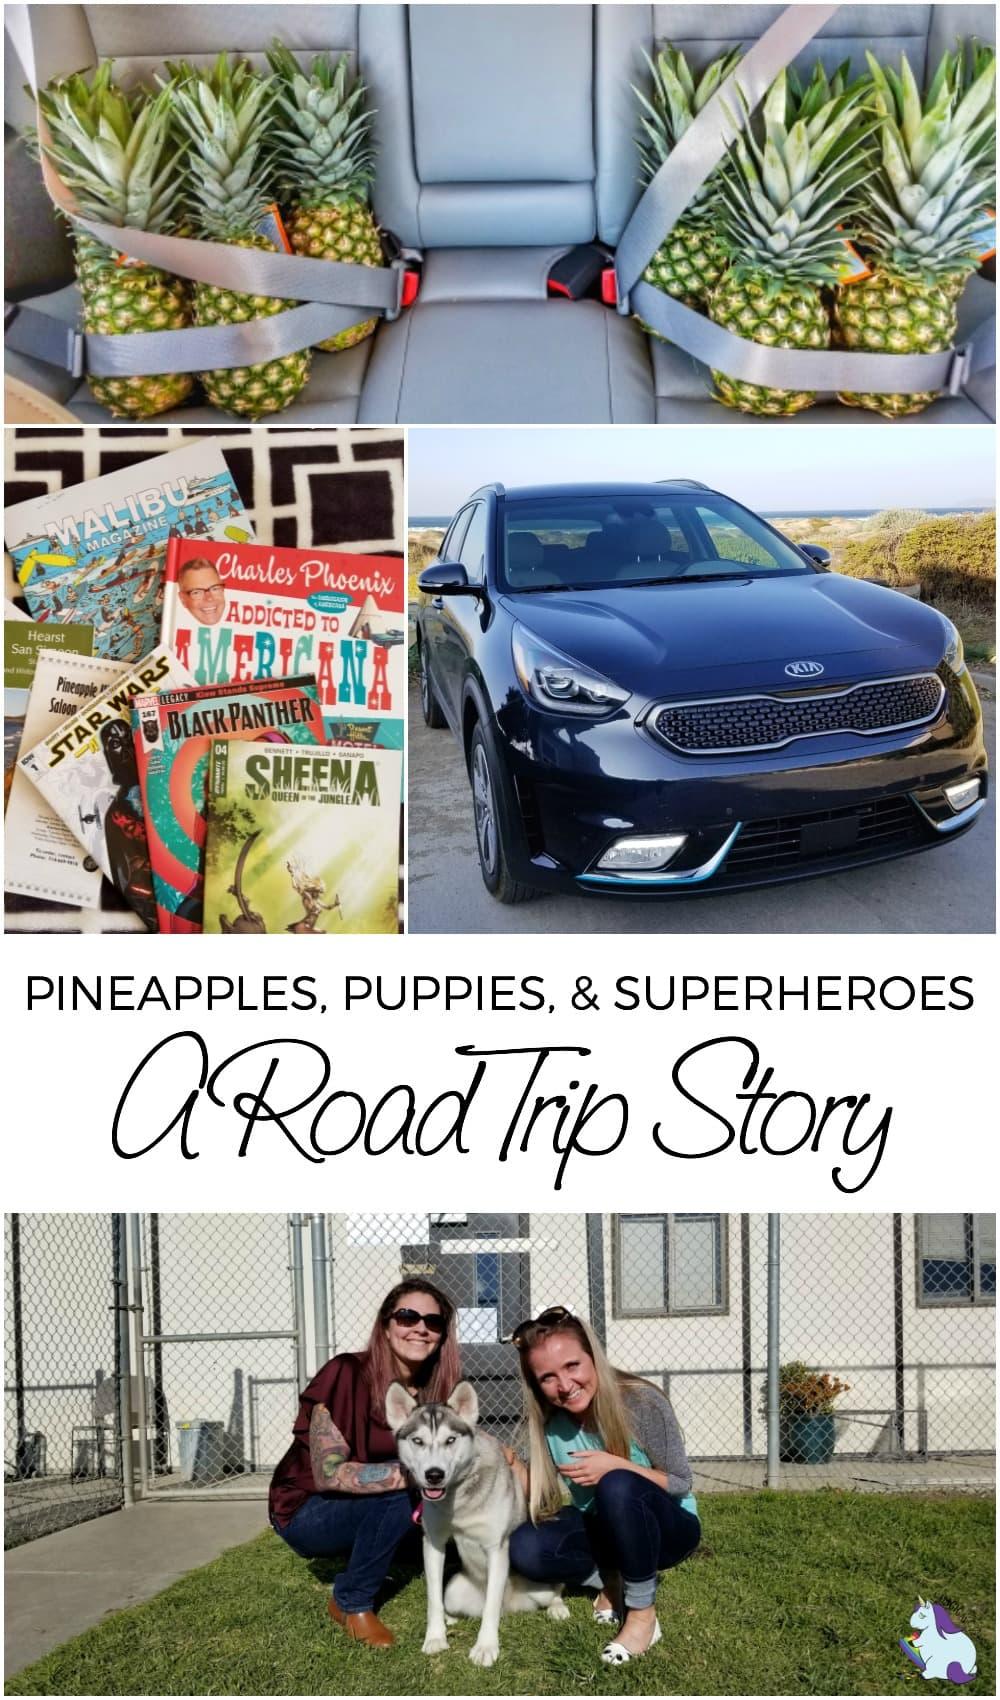 Kia Niro PHEV Road Trip - Full of Pineapples, Puppies, and Superheroes #NiroRoadTrip #KiaNiroPHEV #animals #travel #roadtrip #kia #california #adopt #giveback